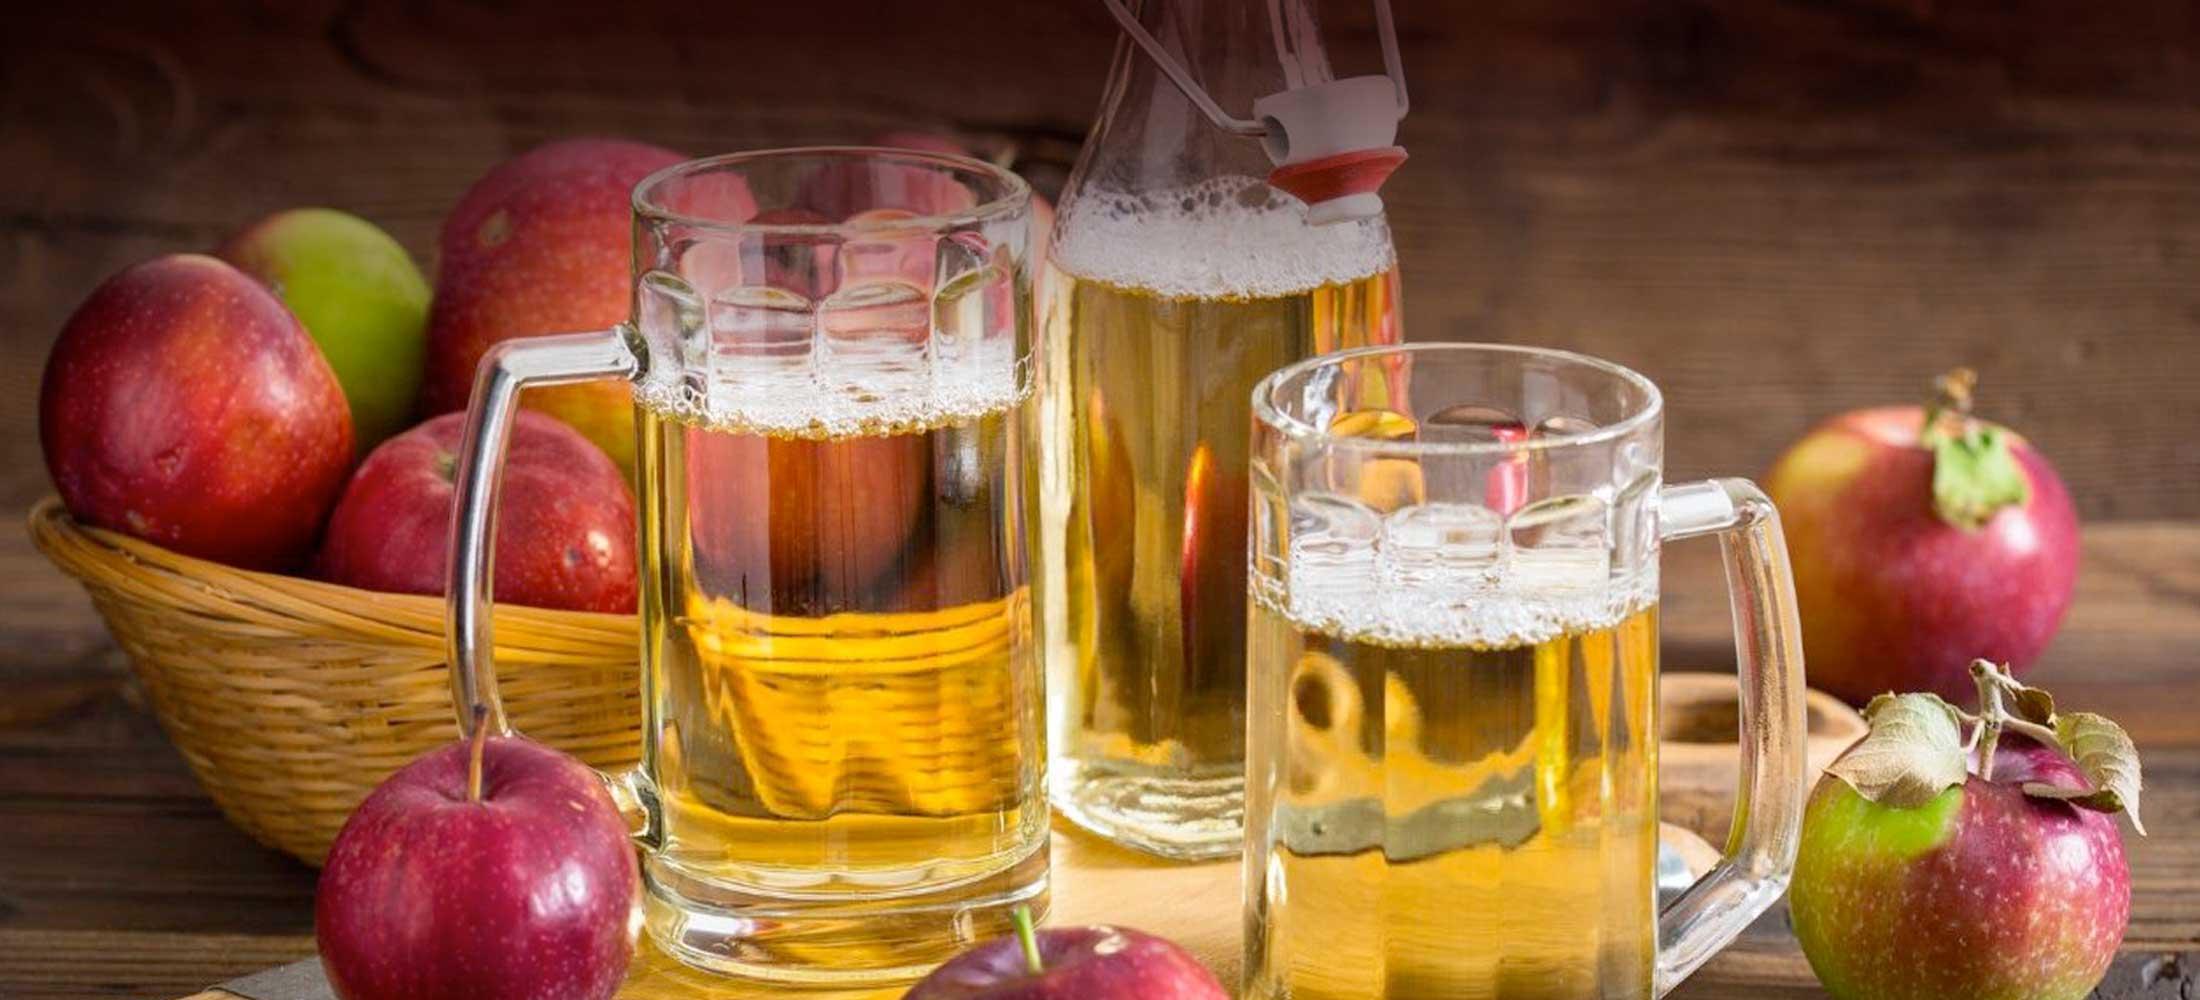 Rhinebeck New York Cider Festival